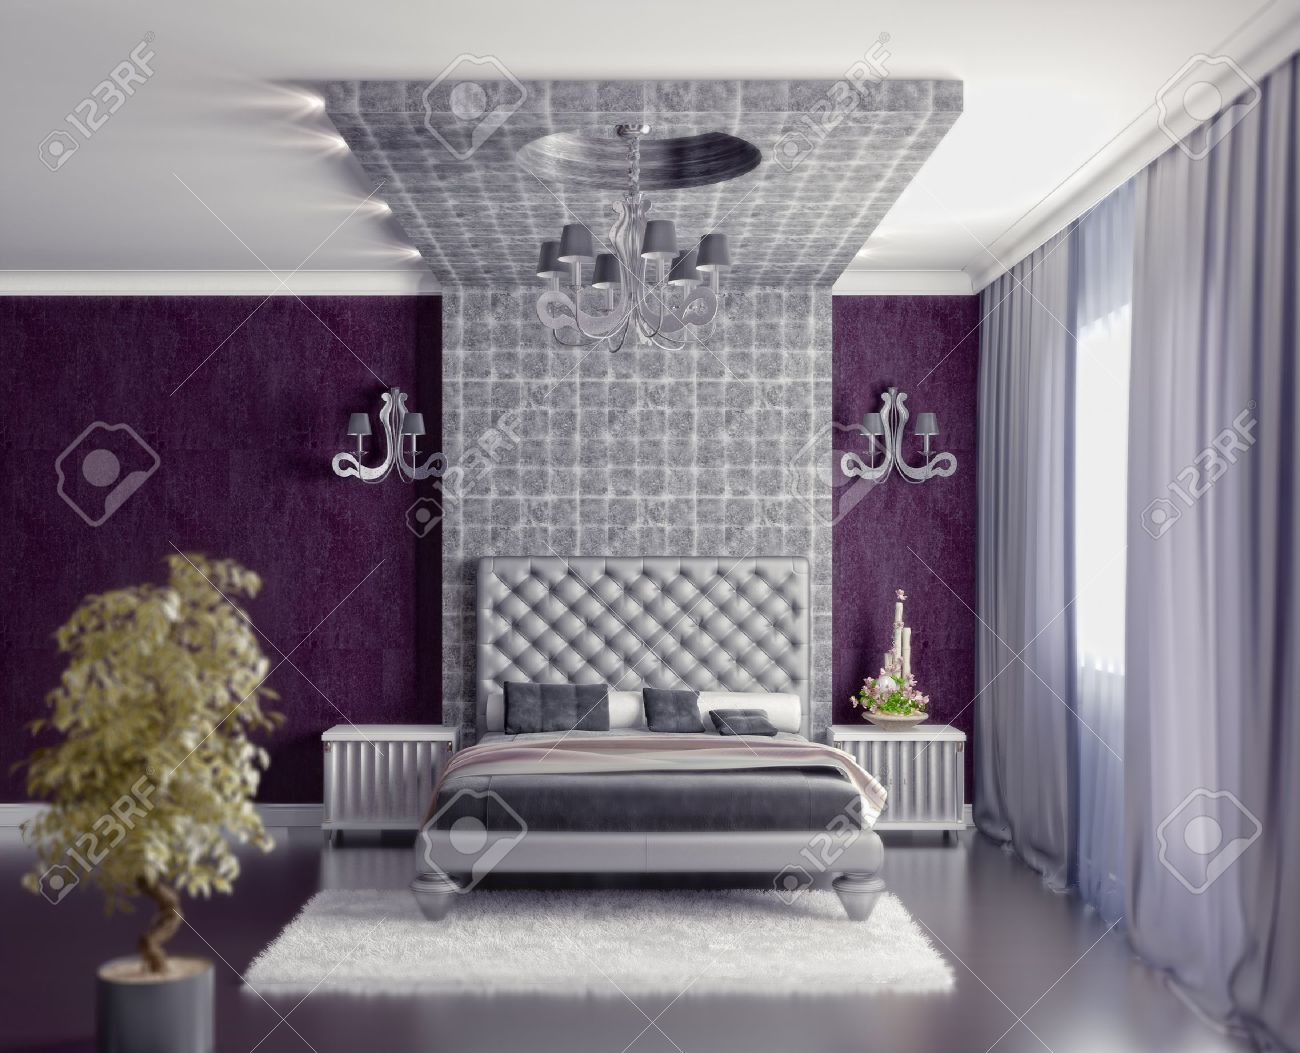 Moderne Stijl Slaapkamer Interieur 3d Renderen (DOF Efffect ...